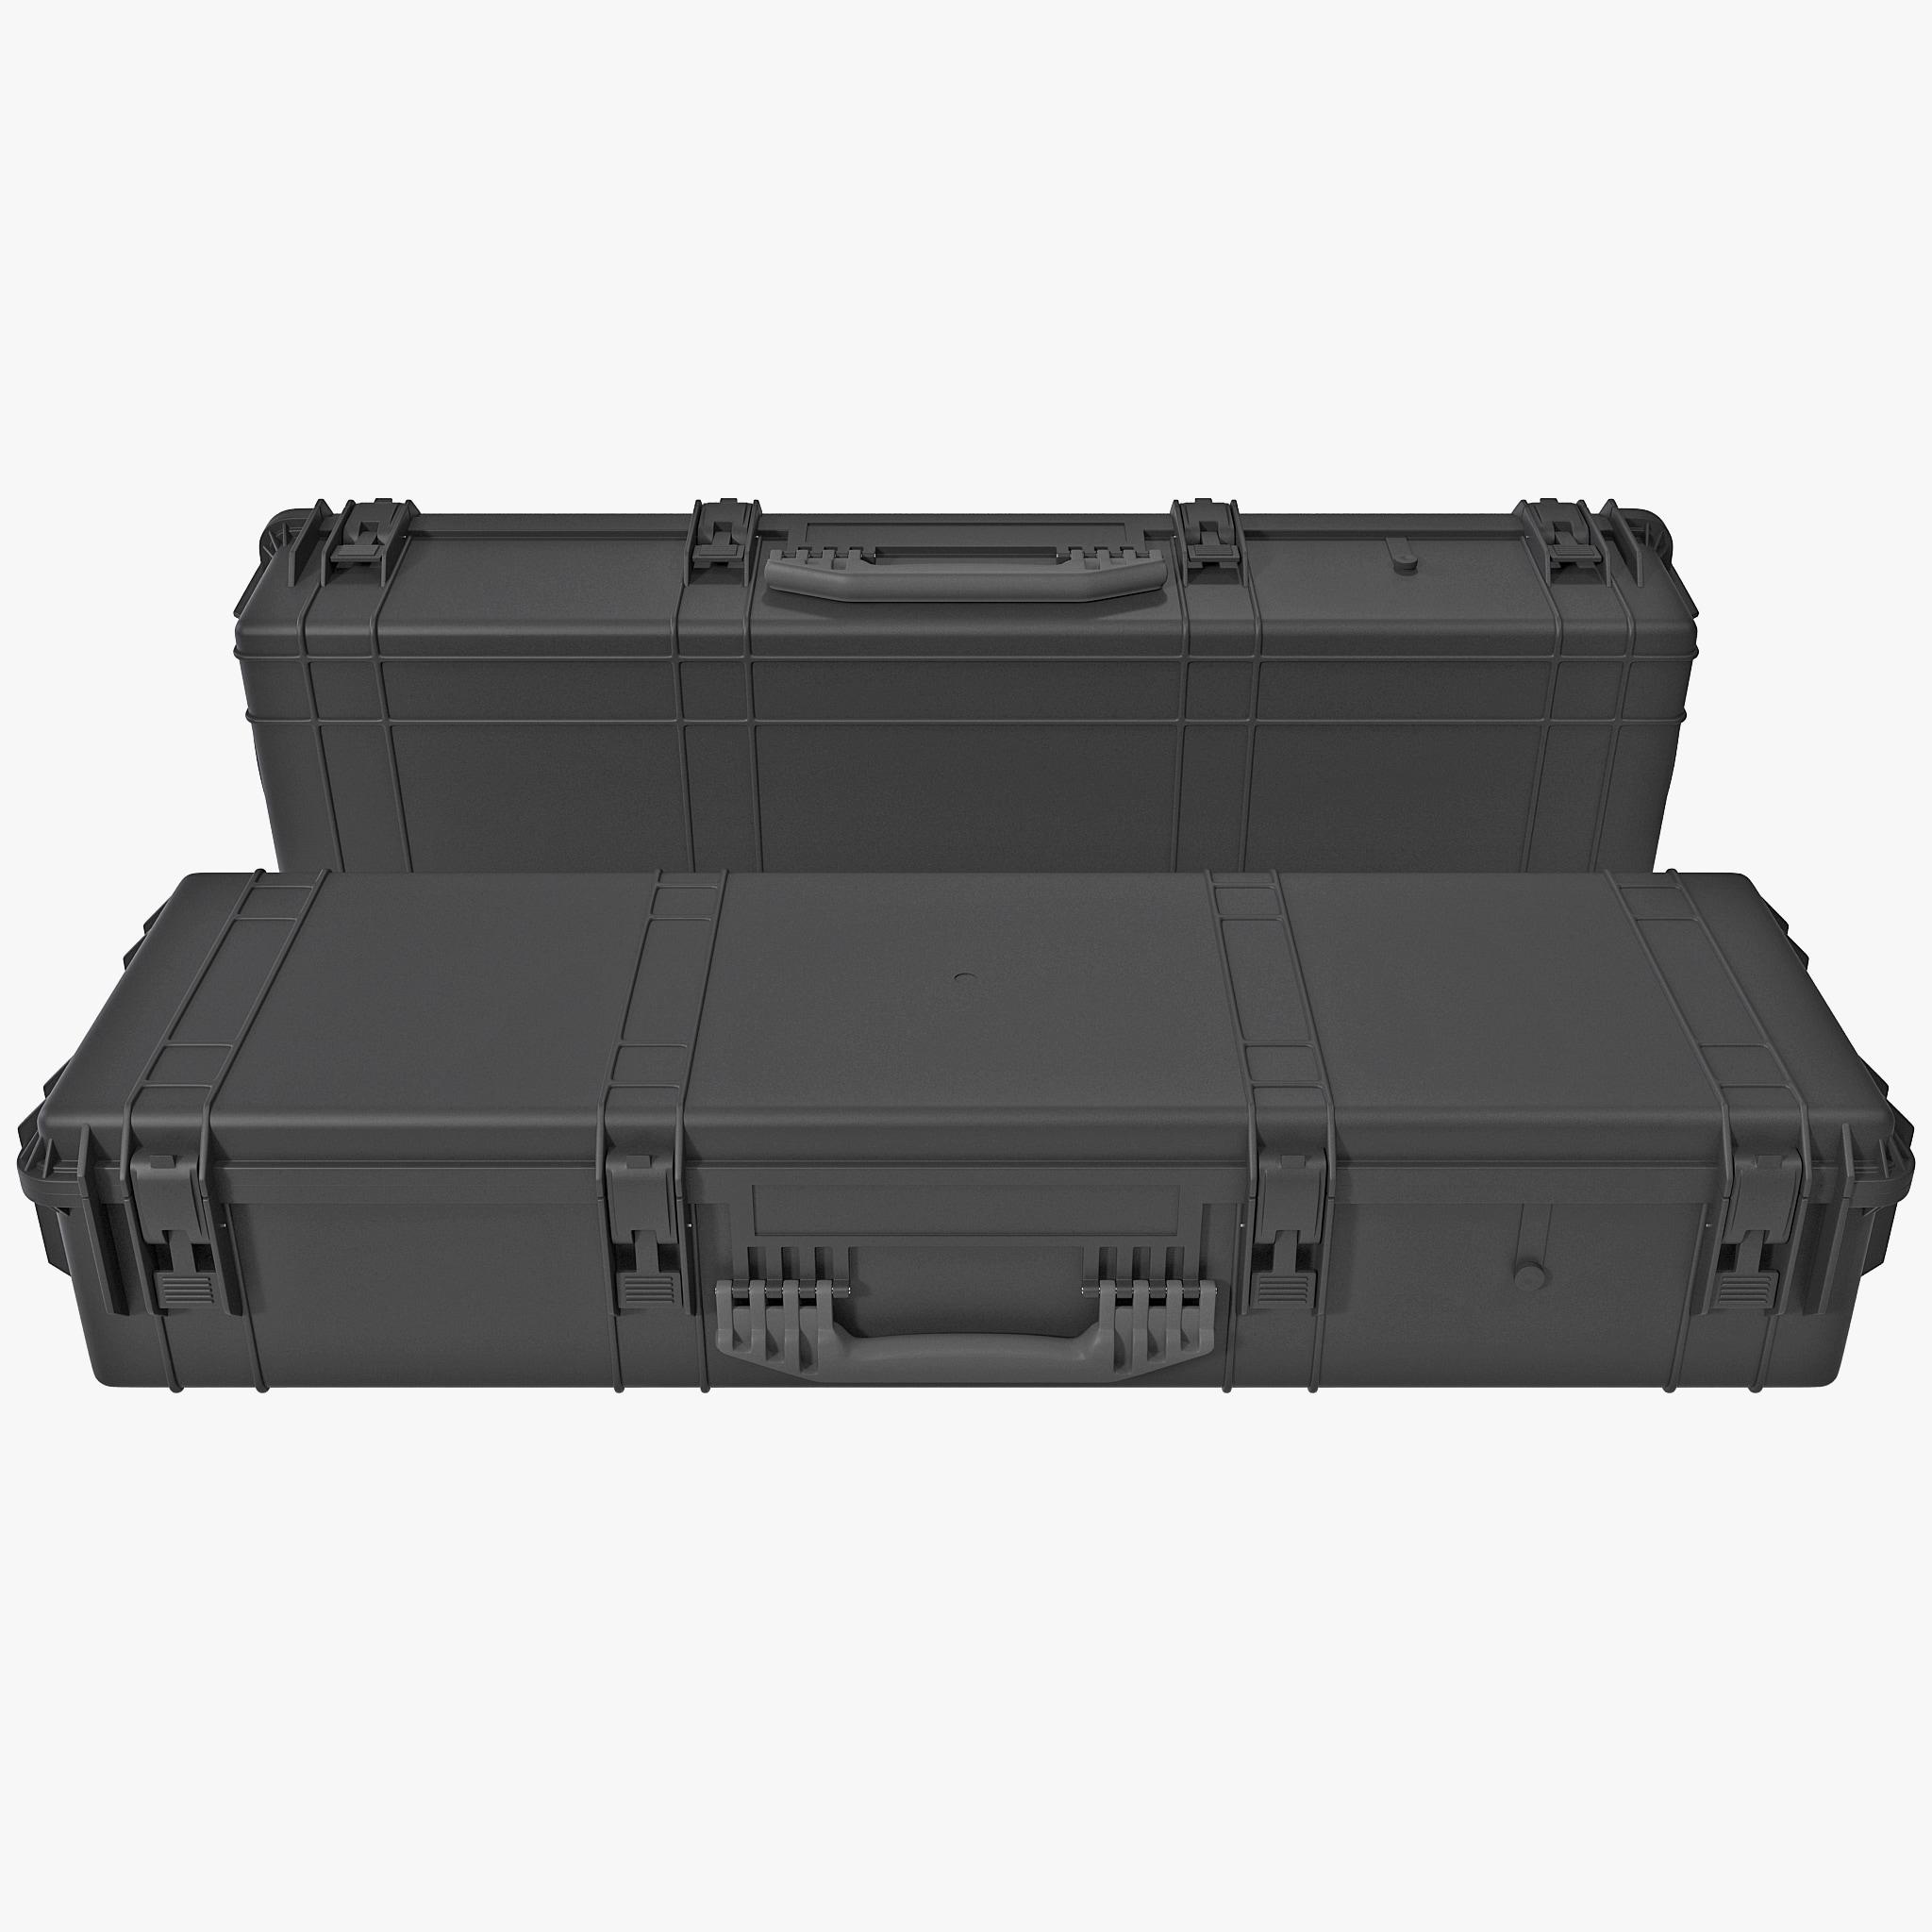 3d model of military case